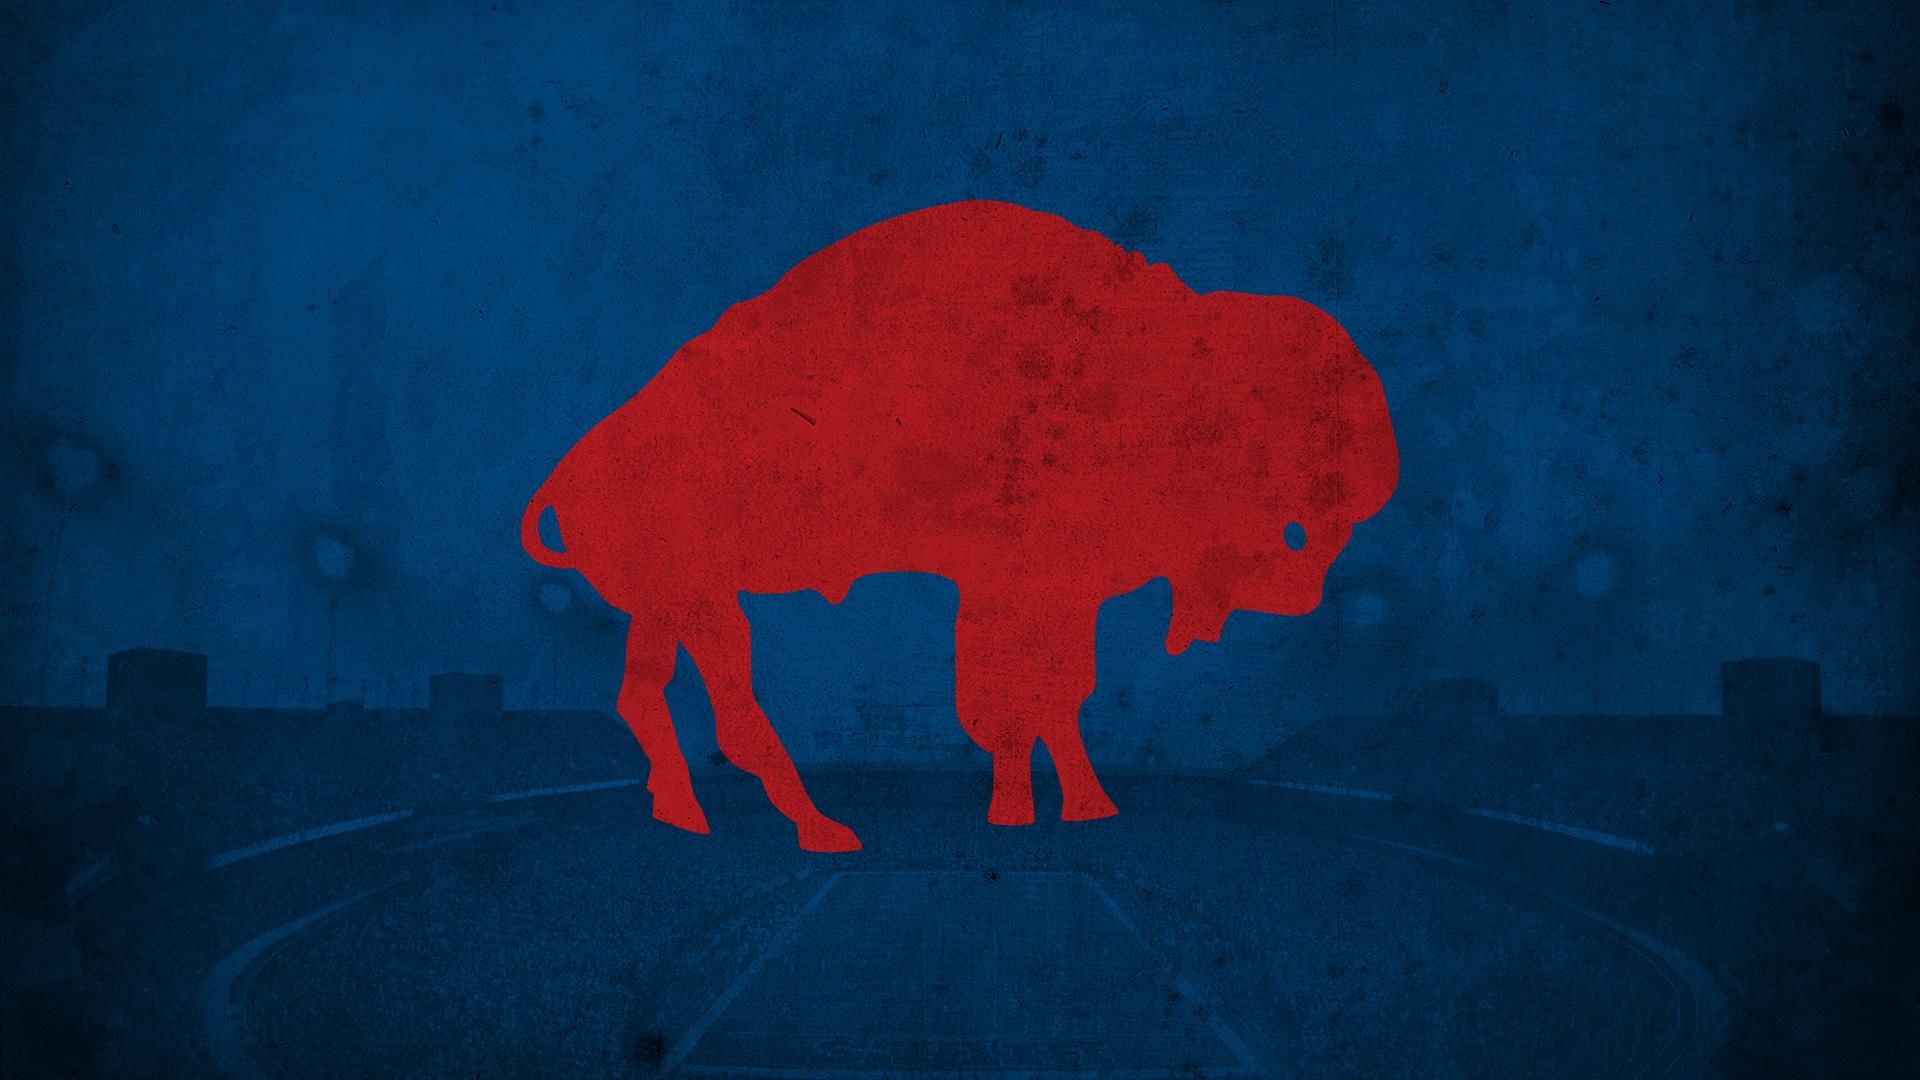 Buffalo Bills High Definition